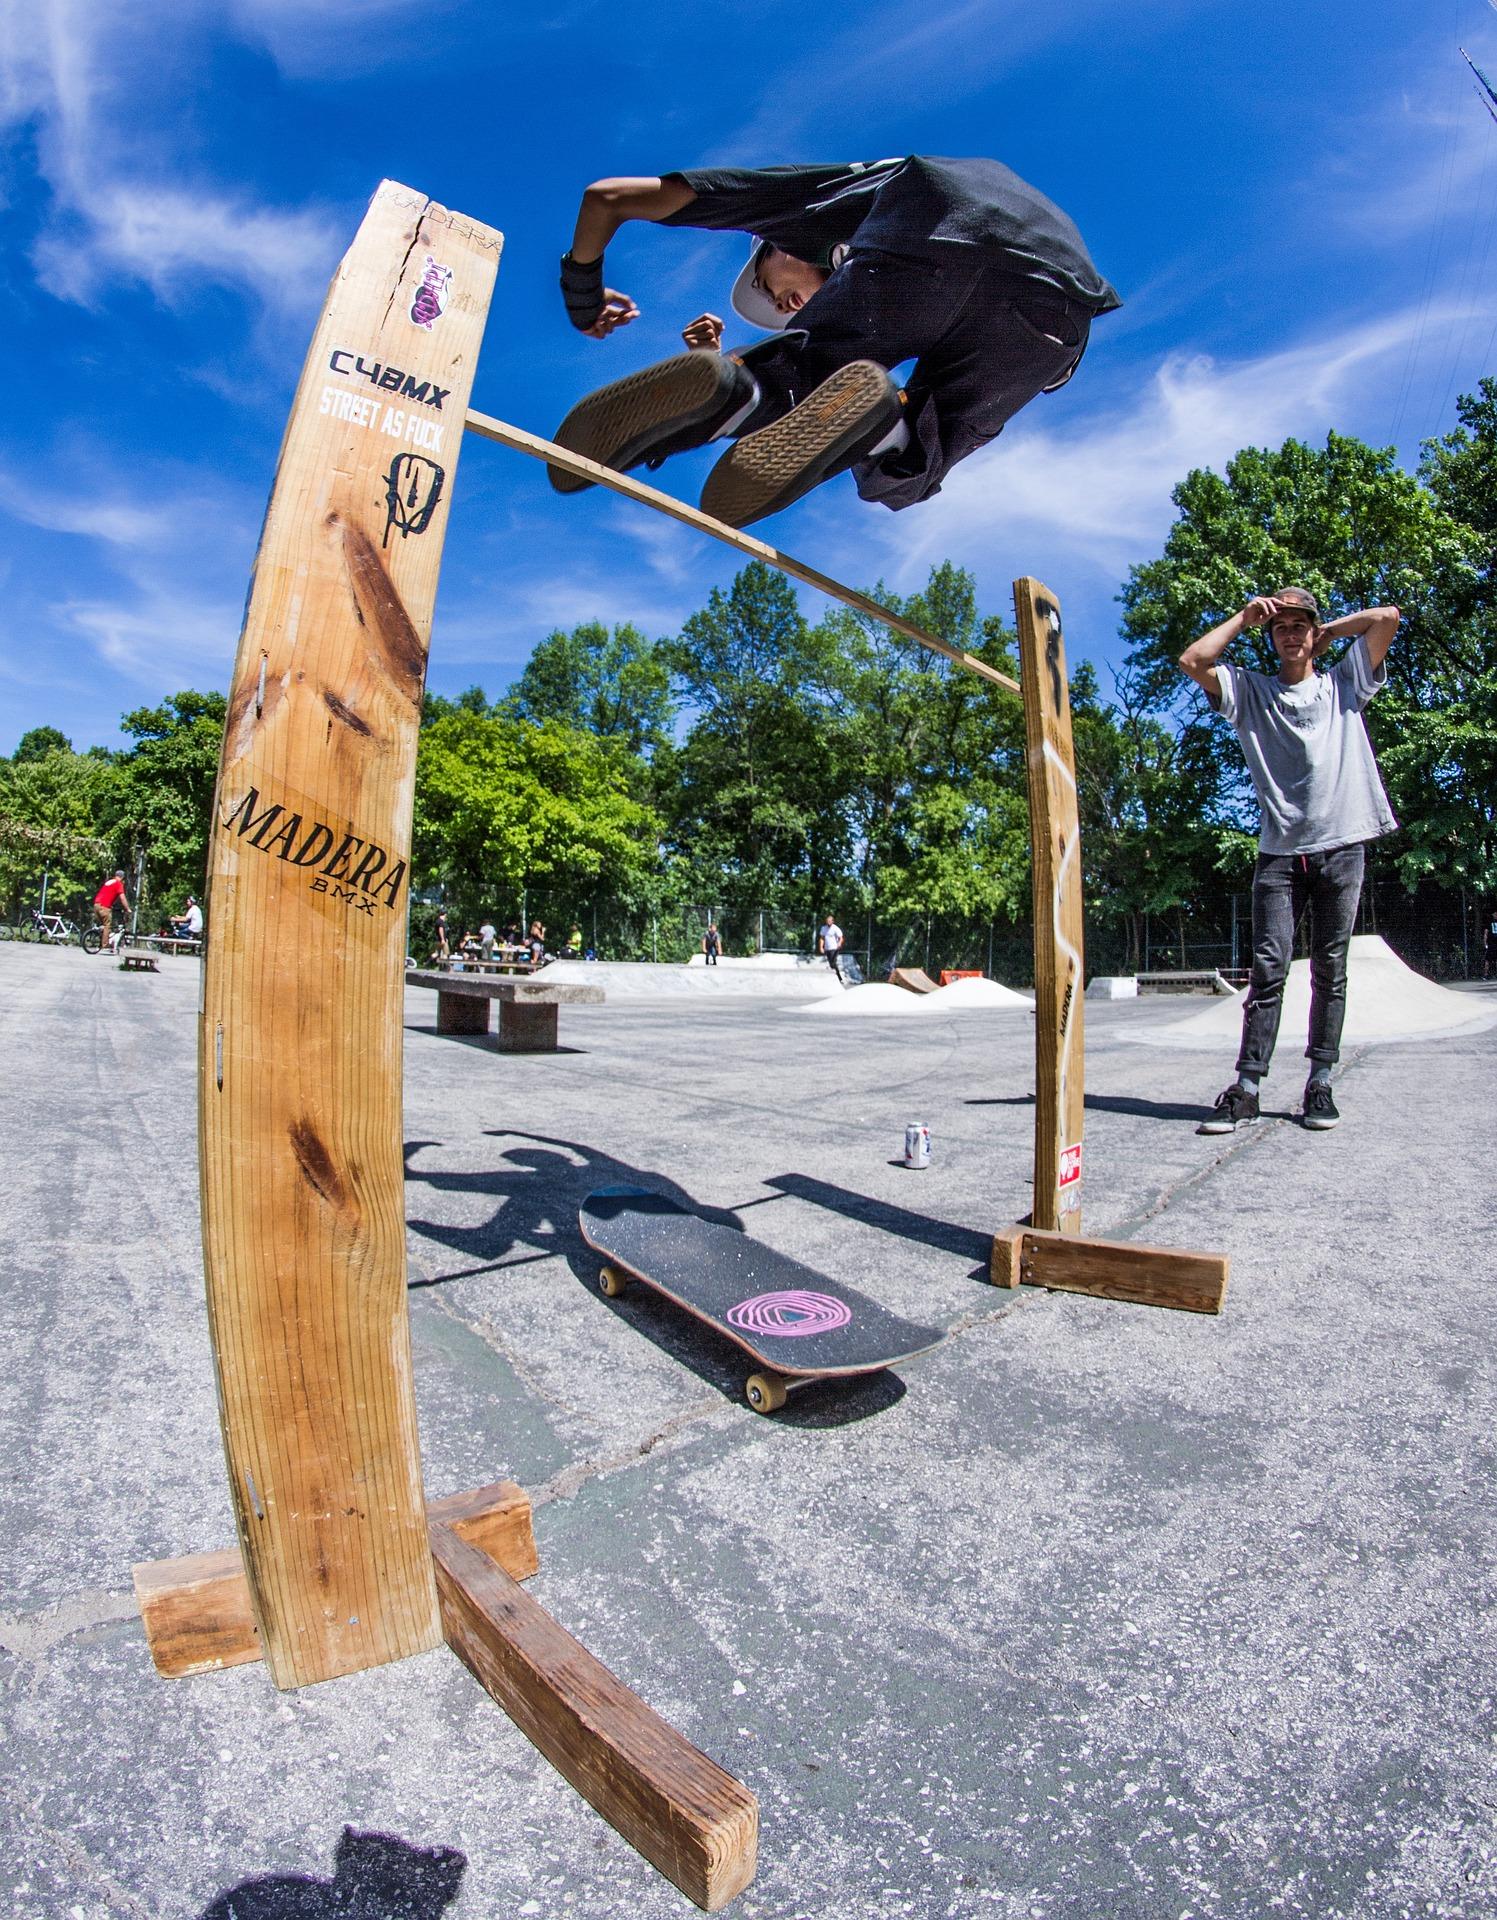 Meilleurs Skateparks à Toulouse - Skatepark Sacaros